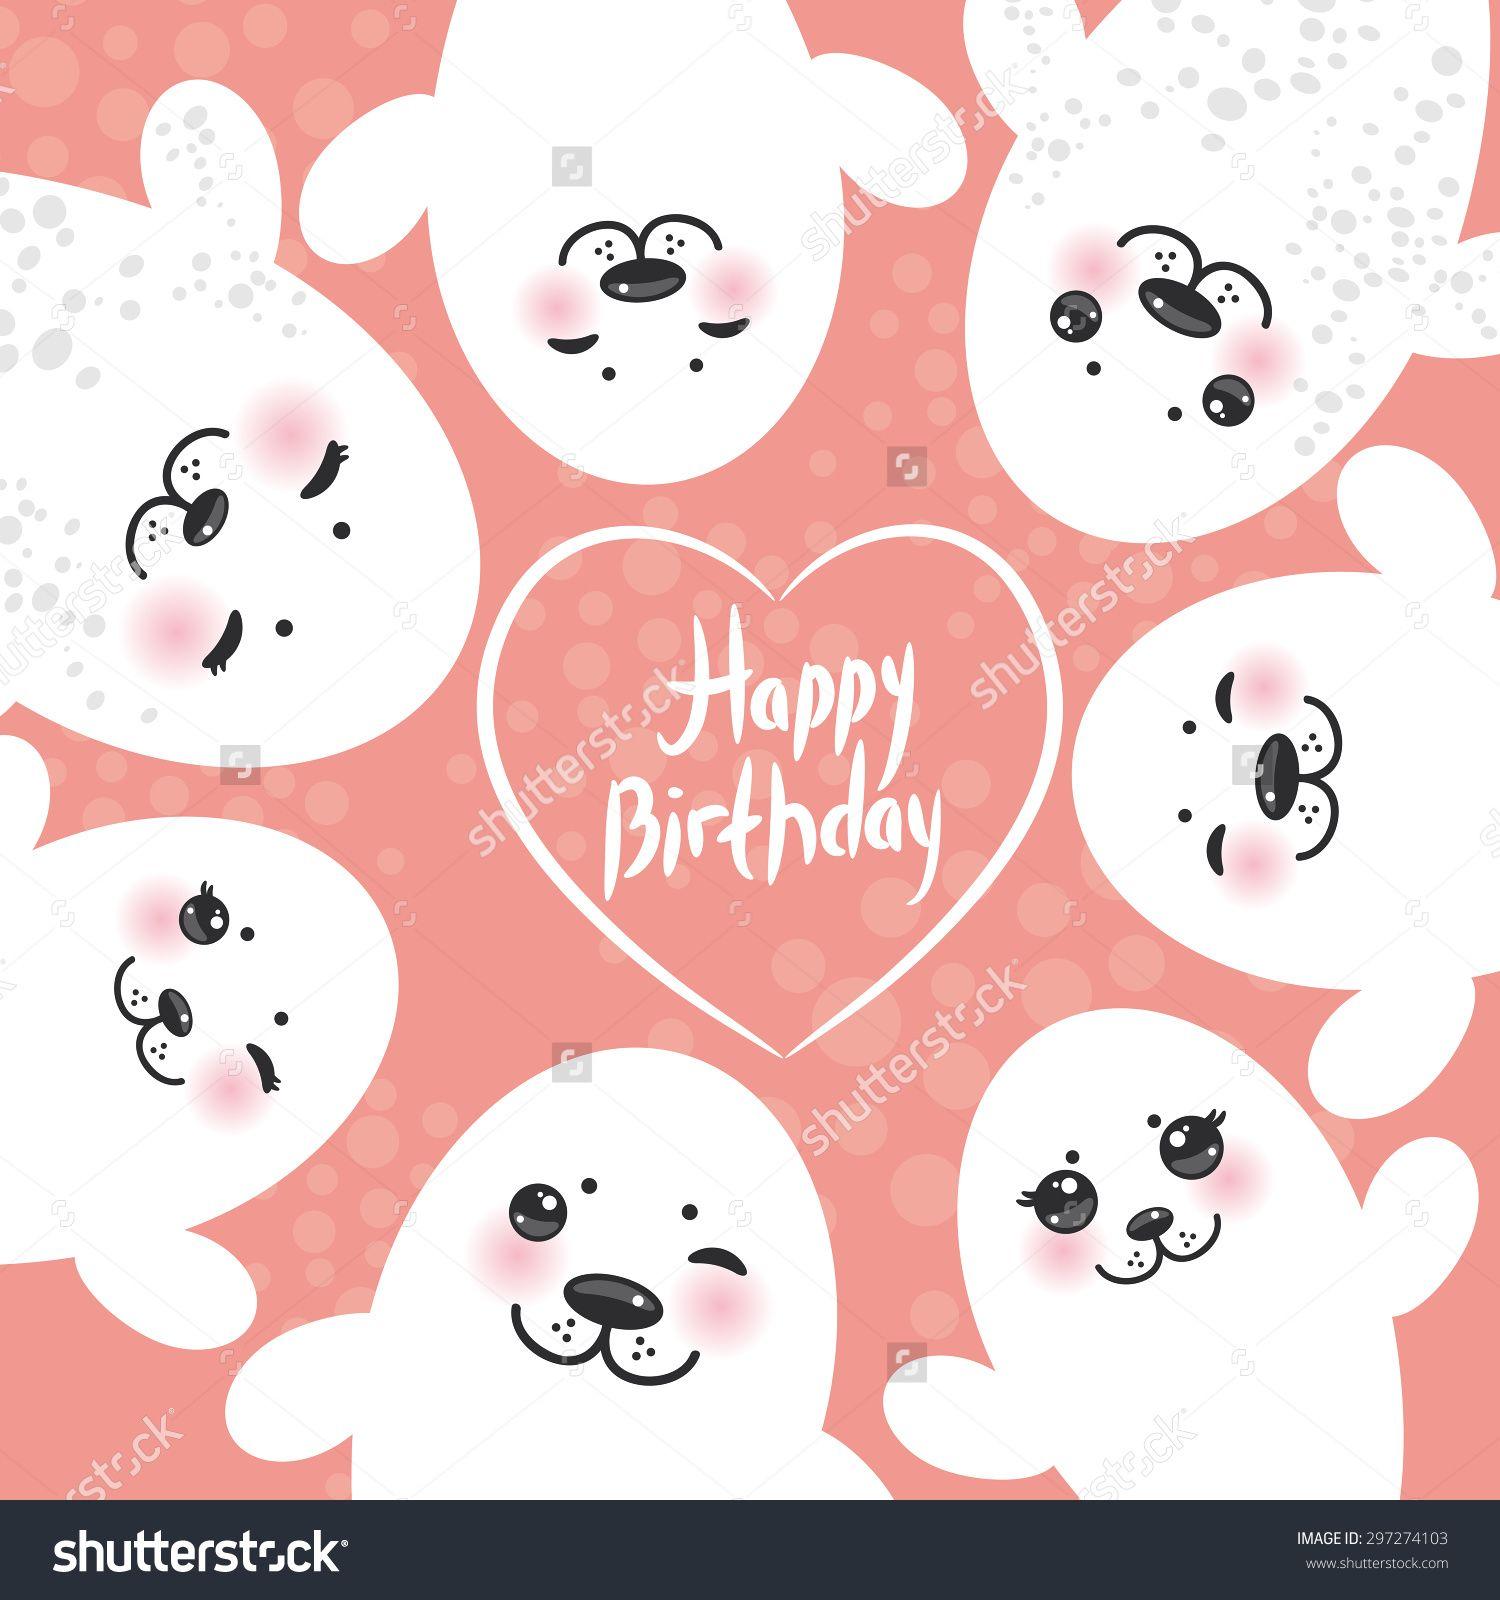 stockvectorhappybirthdaycarddesignfunnywhitefursealpups – Happy Birthday Cards Cute